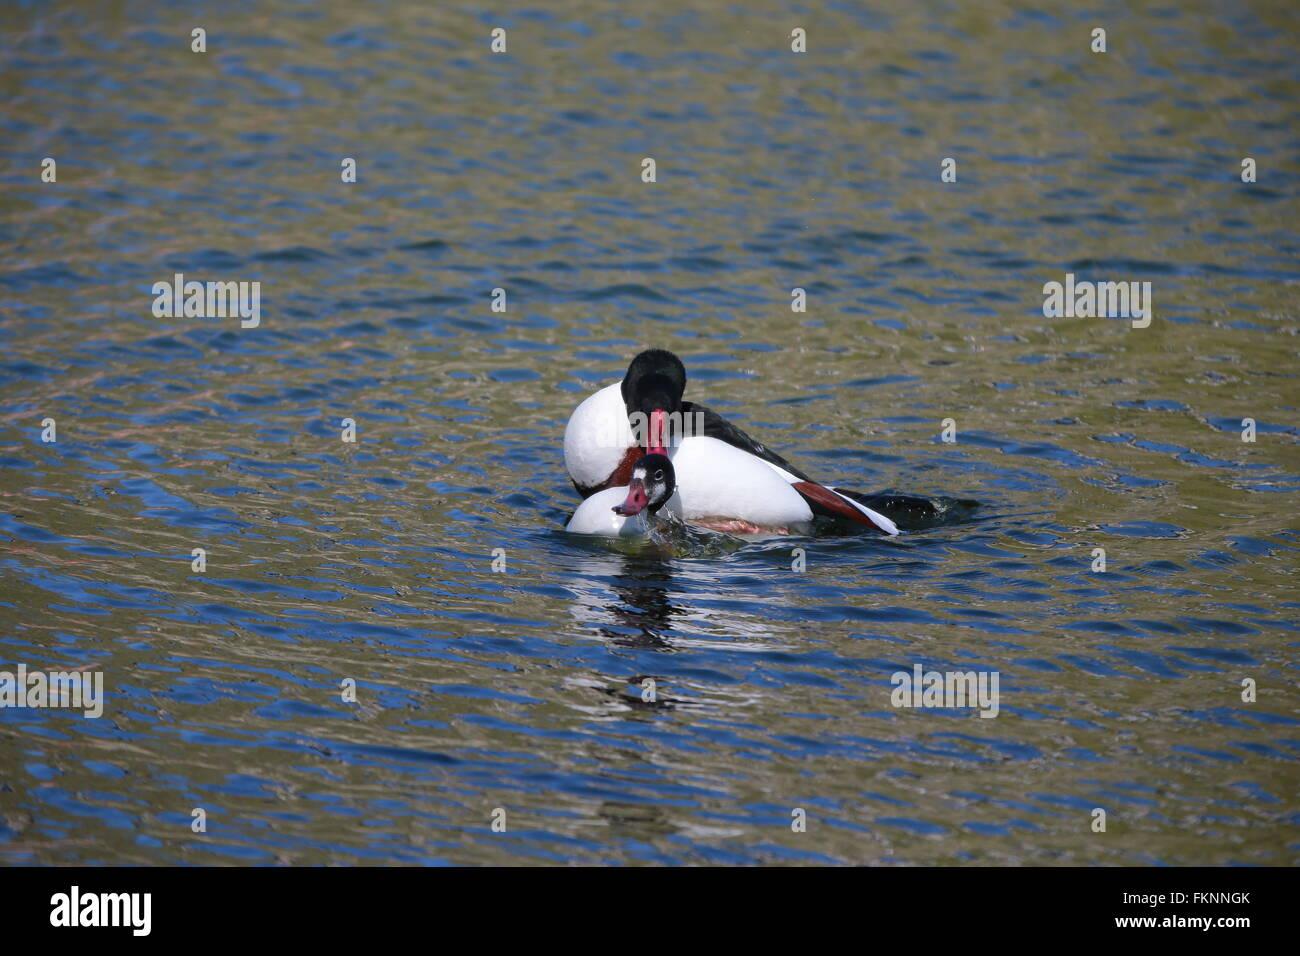 Wild goose flying (tadorna tadorna) - Stock Image